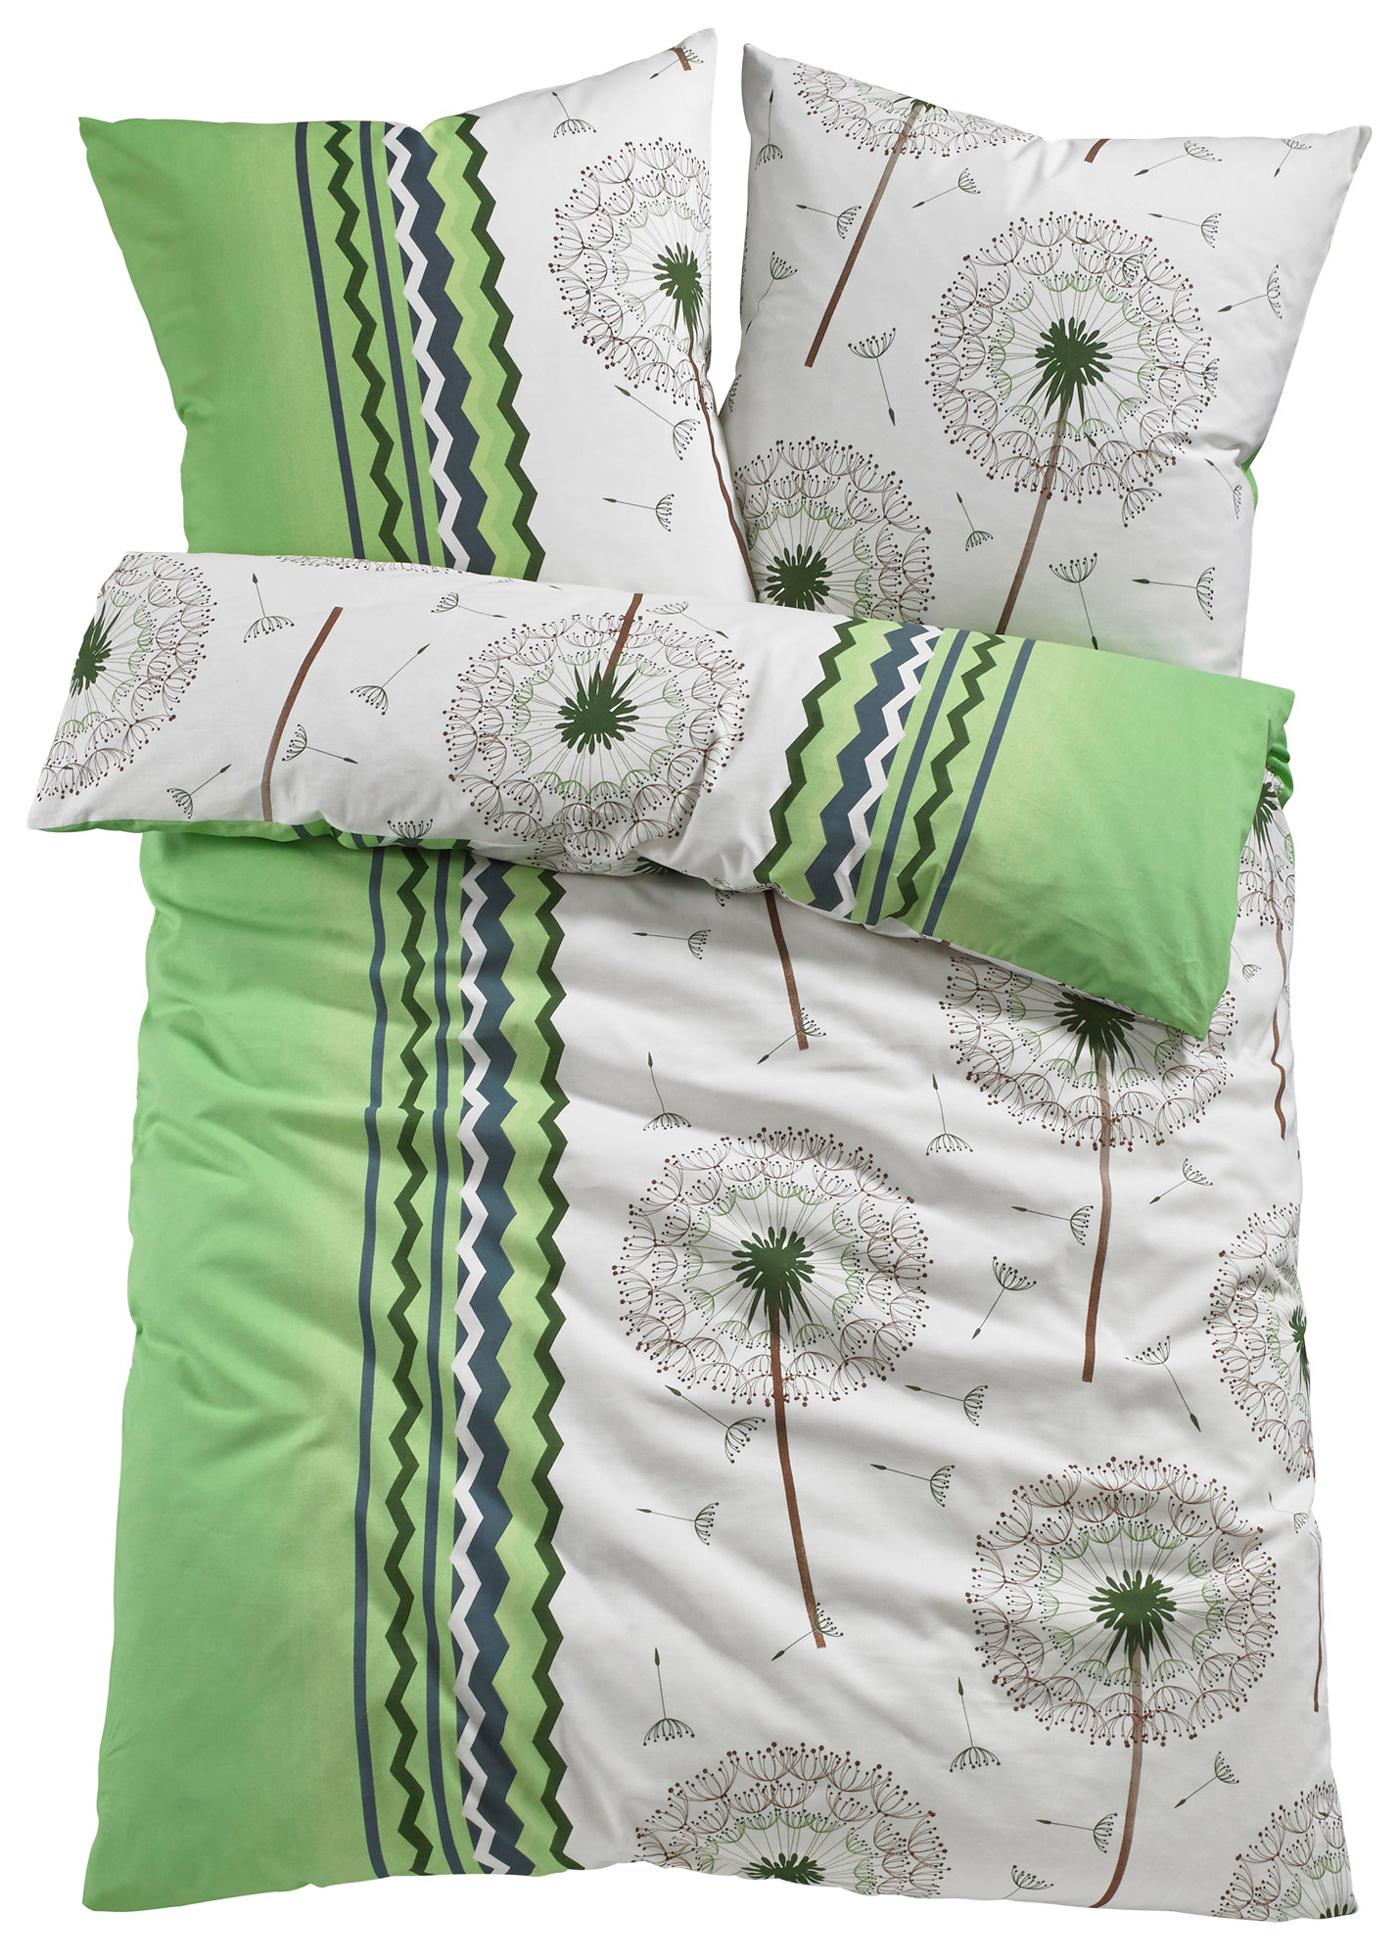 Bpc Living Bettwäsche Pusteblume, 2-tlg., 1x 80/80 cm + 1x 155/220 cm, Linon in grün von bonprix